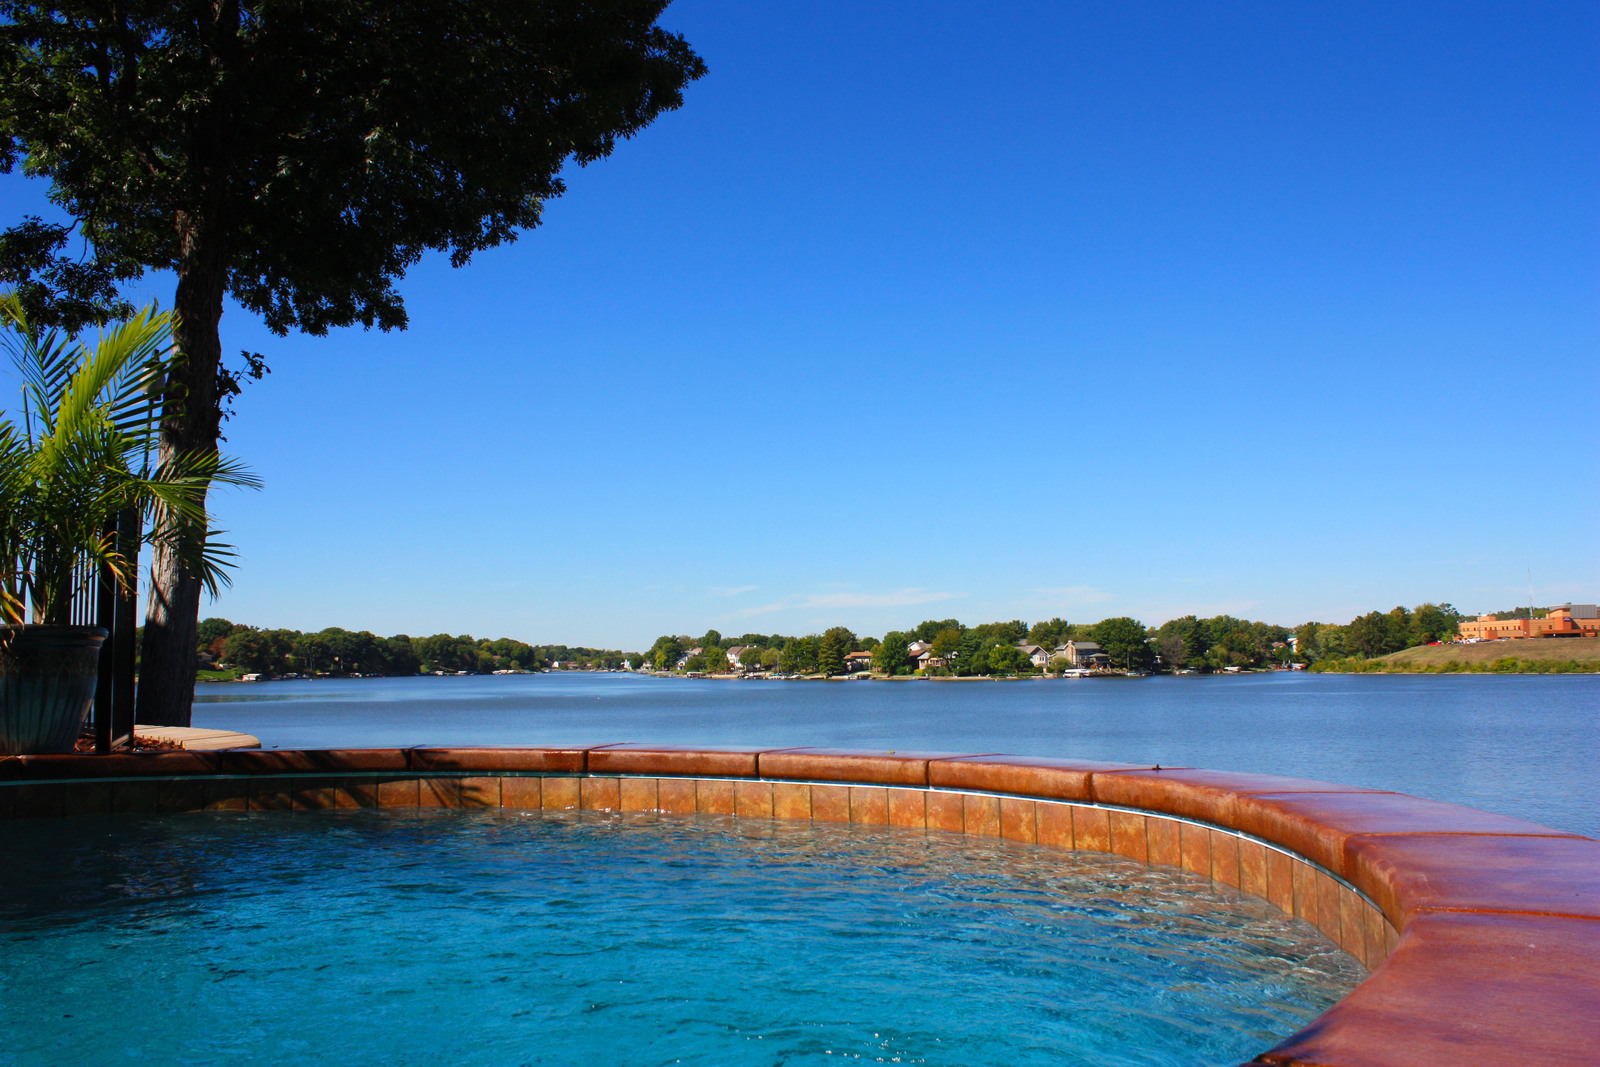 Baker Pool Construction Lake St Louis Love